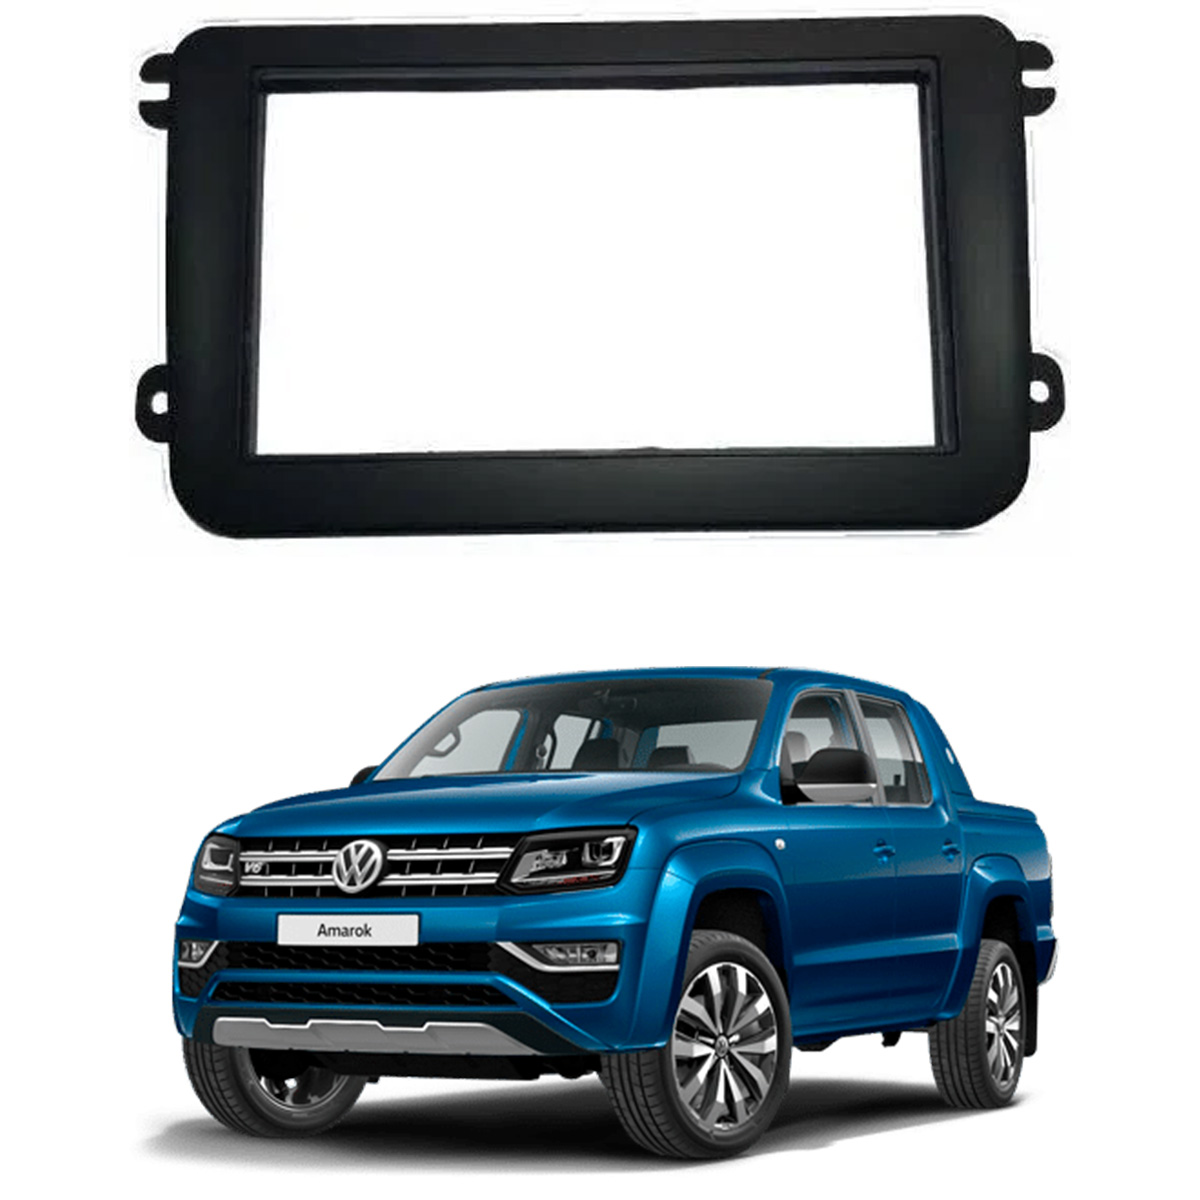 Moldura Volkswagen Amarok 2017 a 2021 9 Polegadas 2 Din Preto Fosco Poliparts